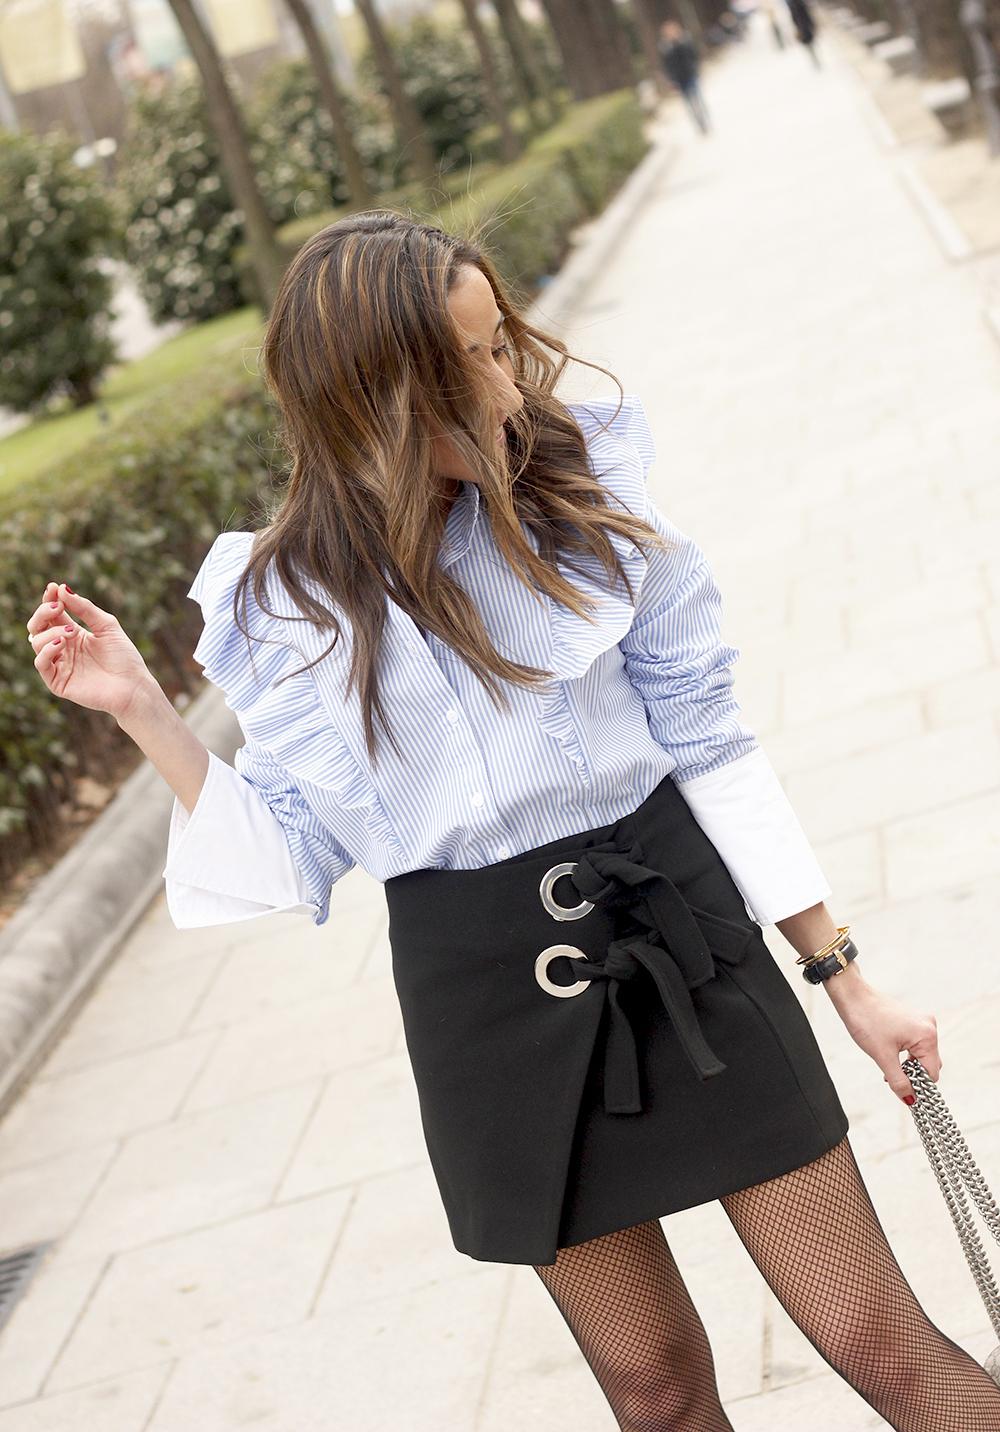 Ruffled striped shirt Fishnet tights black skirt heels gucci bag style fashion outfit 06